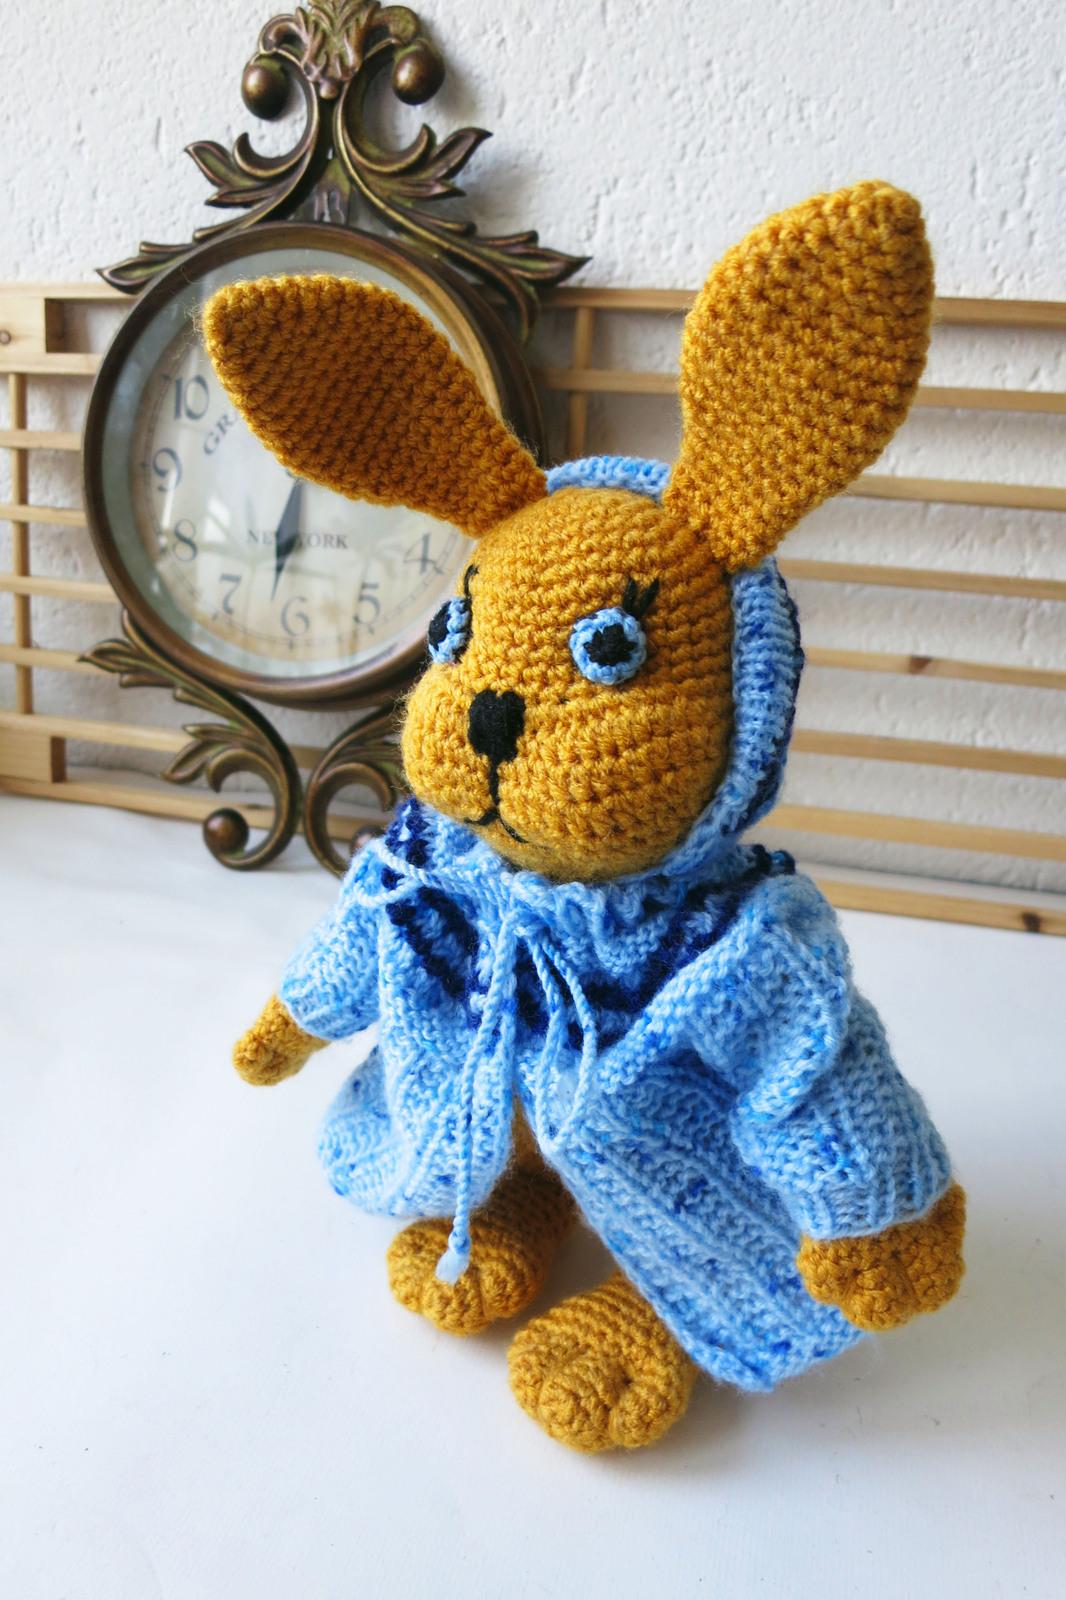 Amigurumi bunny - handmade animal - stuffed soft toy - baby shower gift